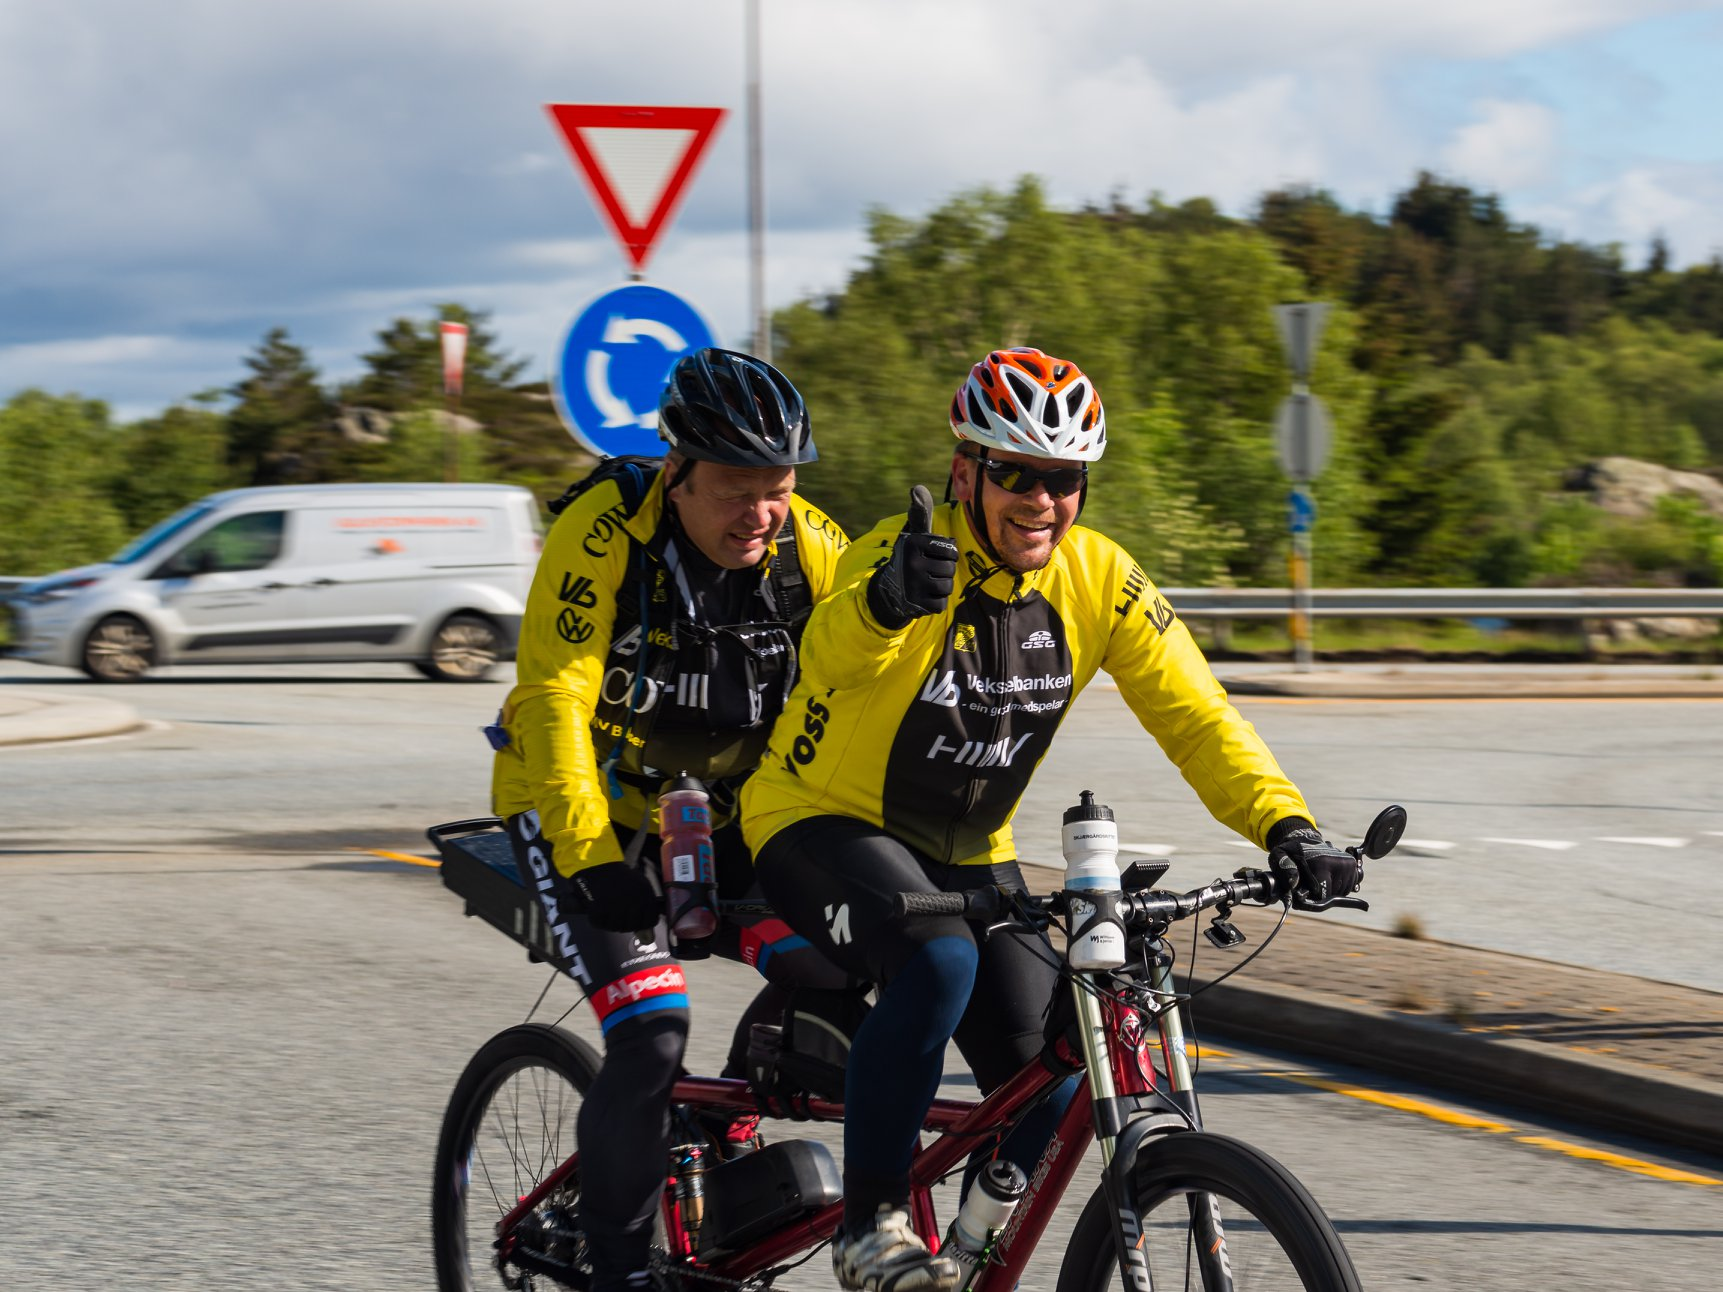 Ved rundkjøring på Kolltveit. Foto: Bent Mittet Opdahl